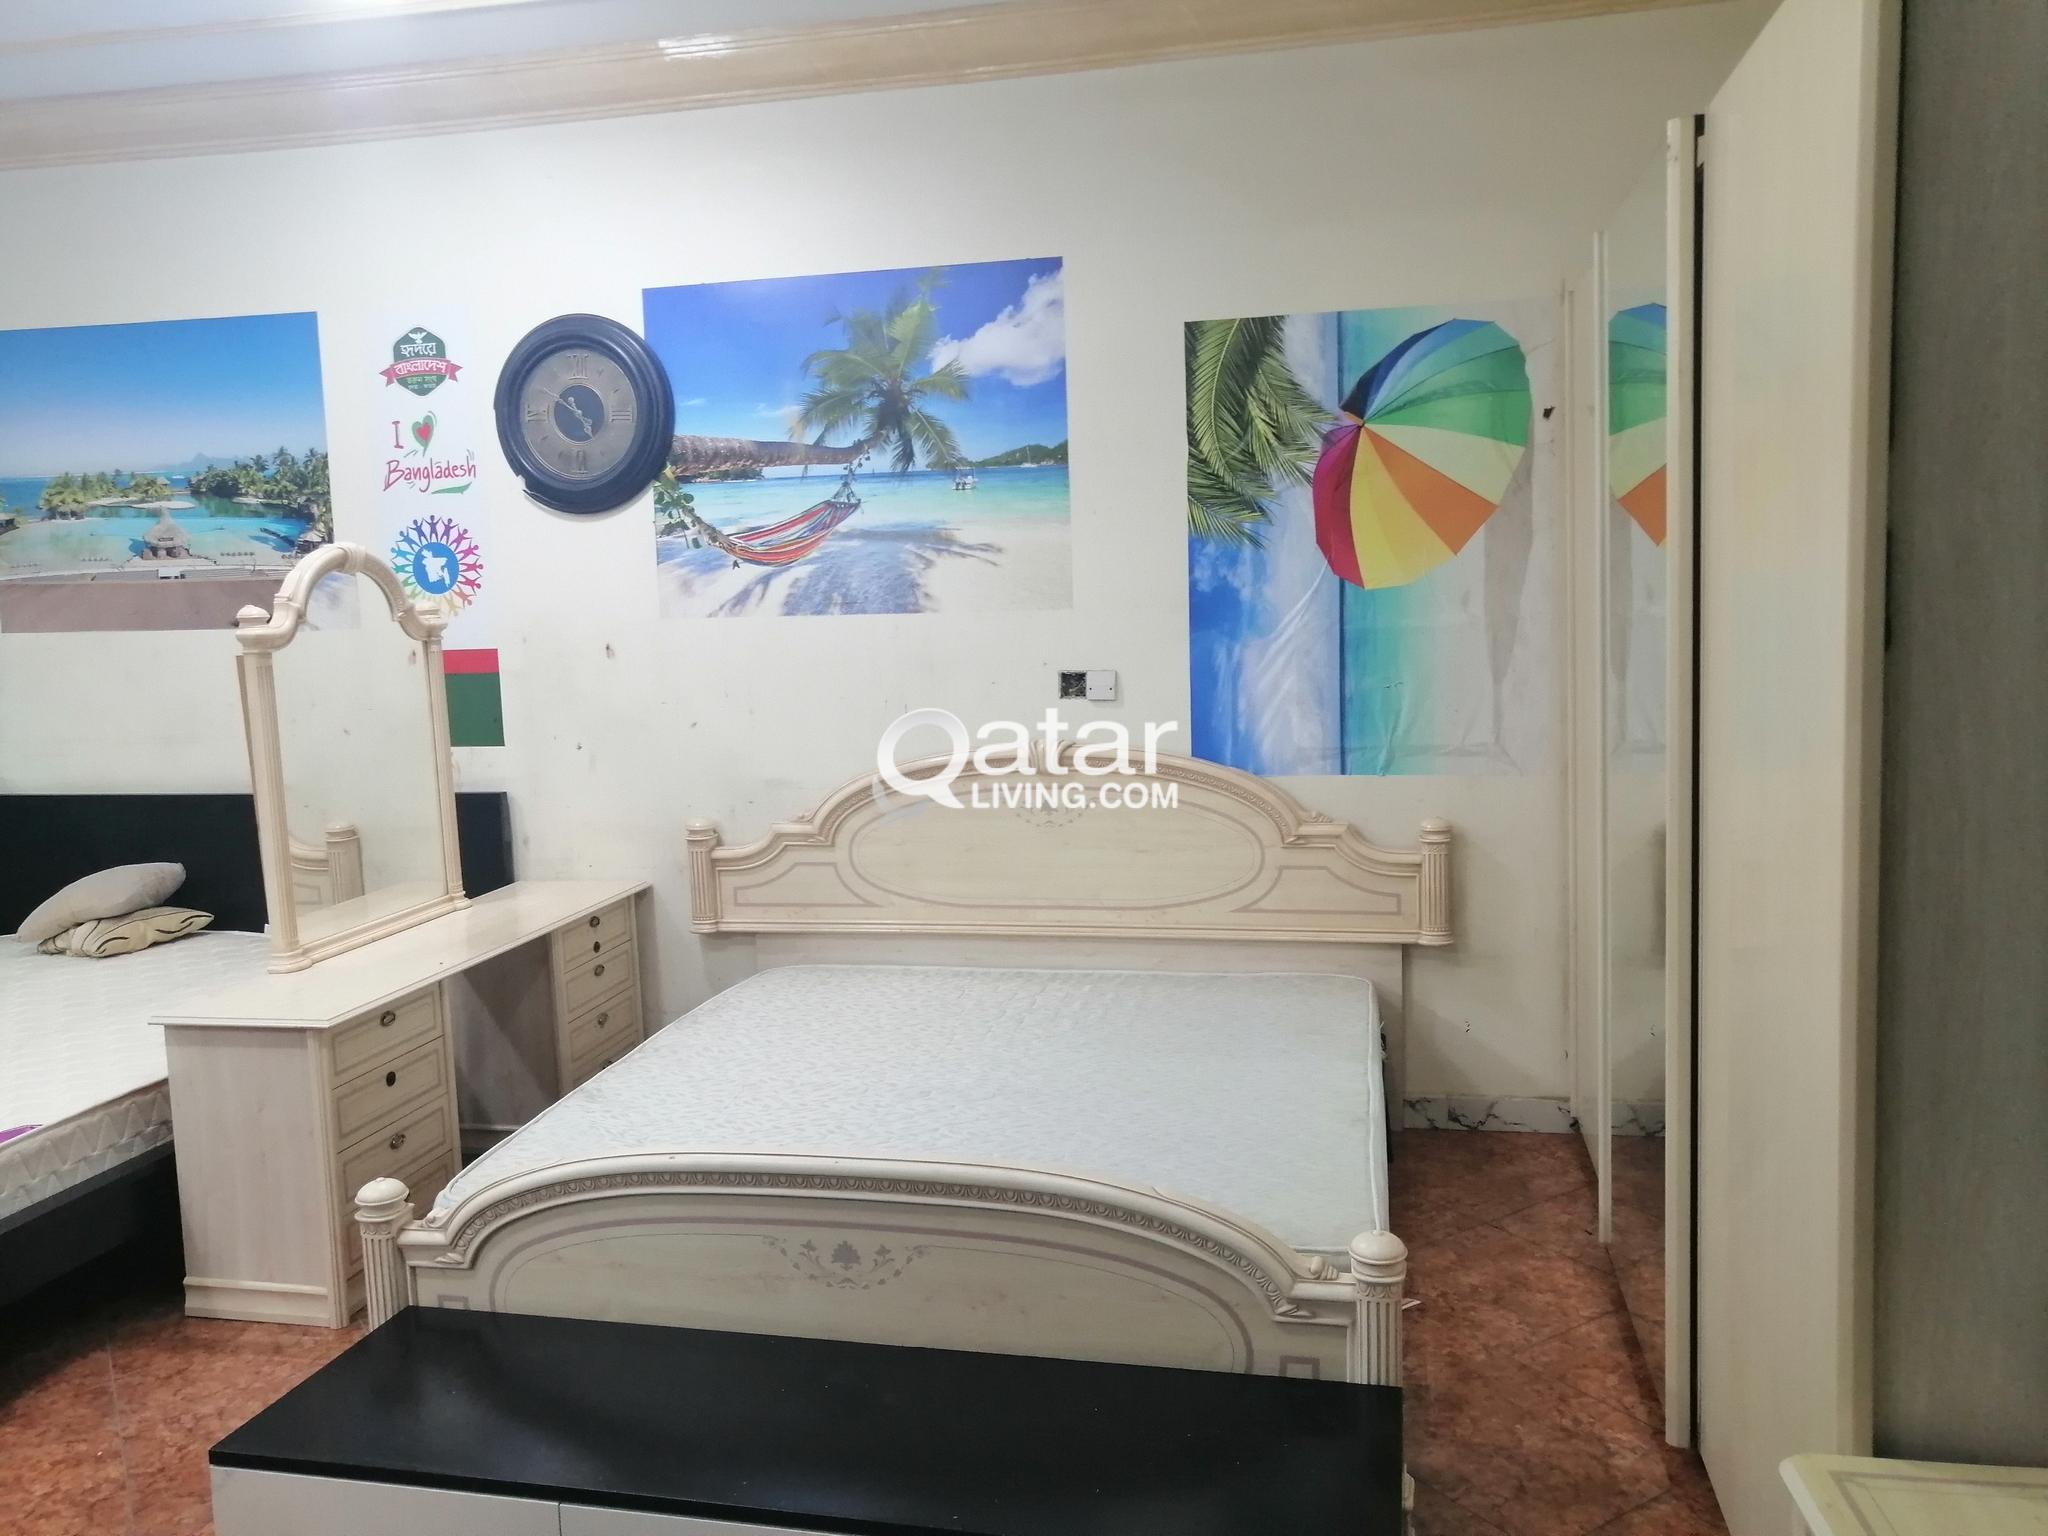 used furniture items salle.77200805